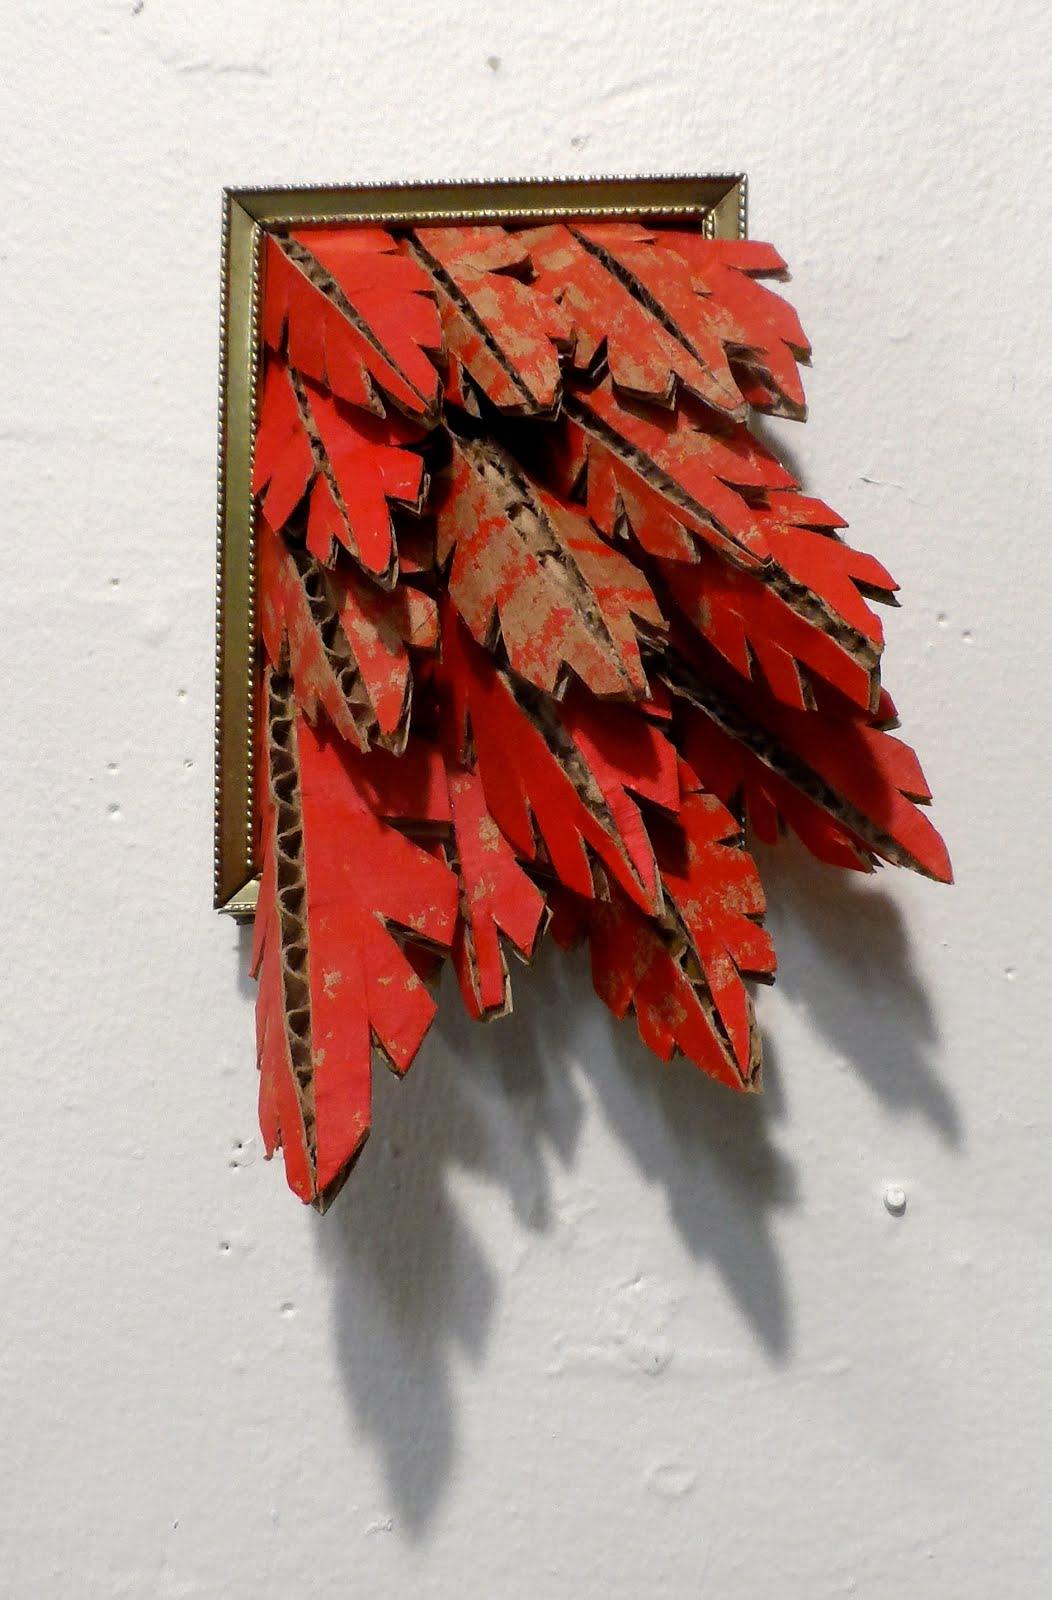 8_Feathers.JPG